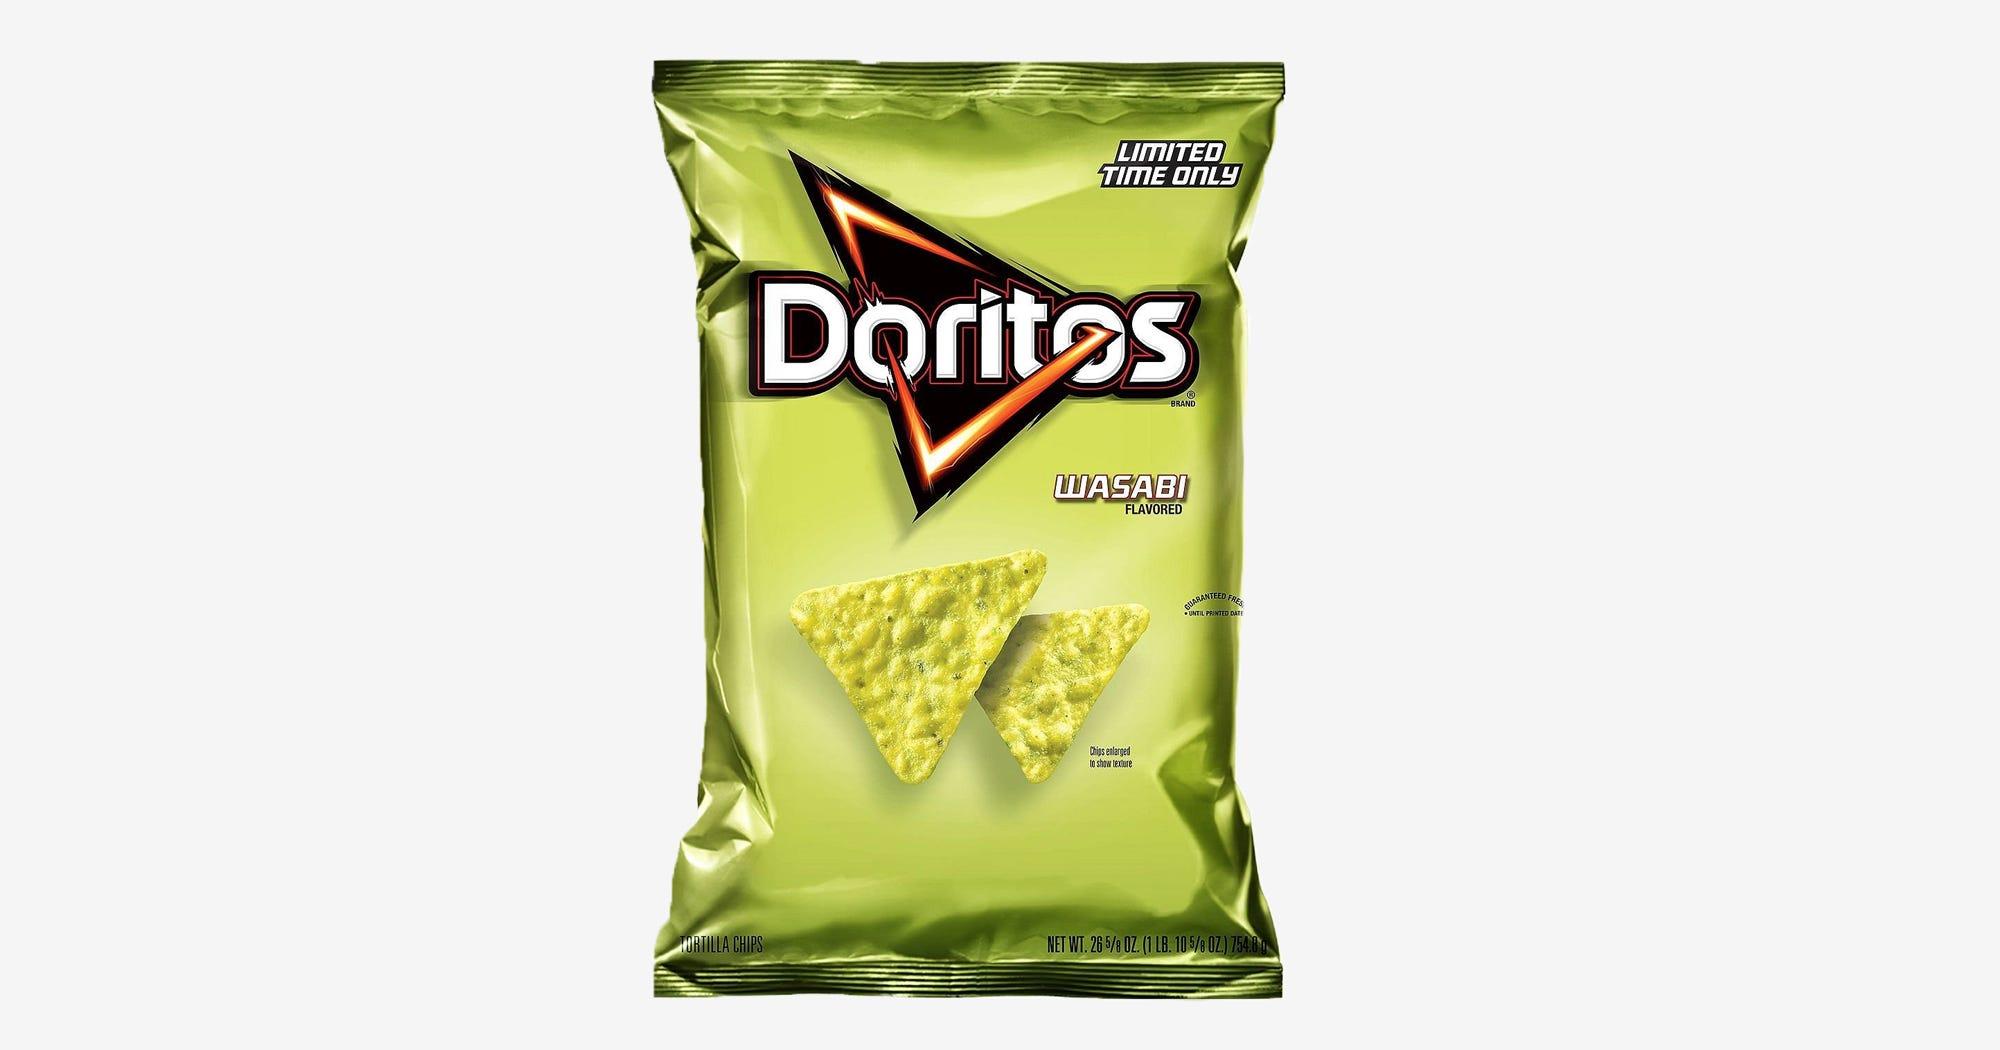 Wasabi Doritos Limited Edition New Flavor Walmart